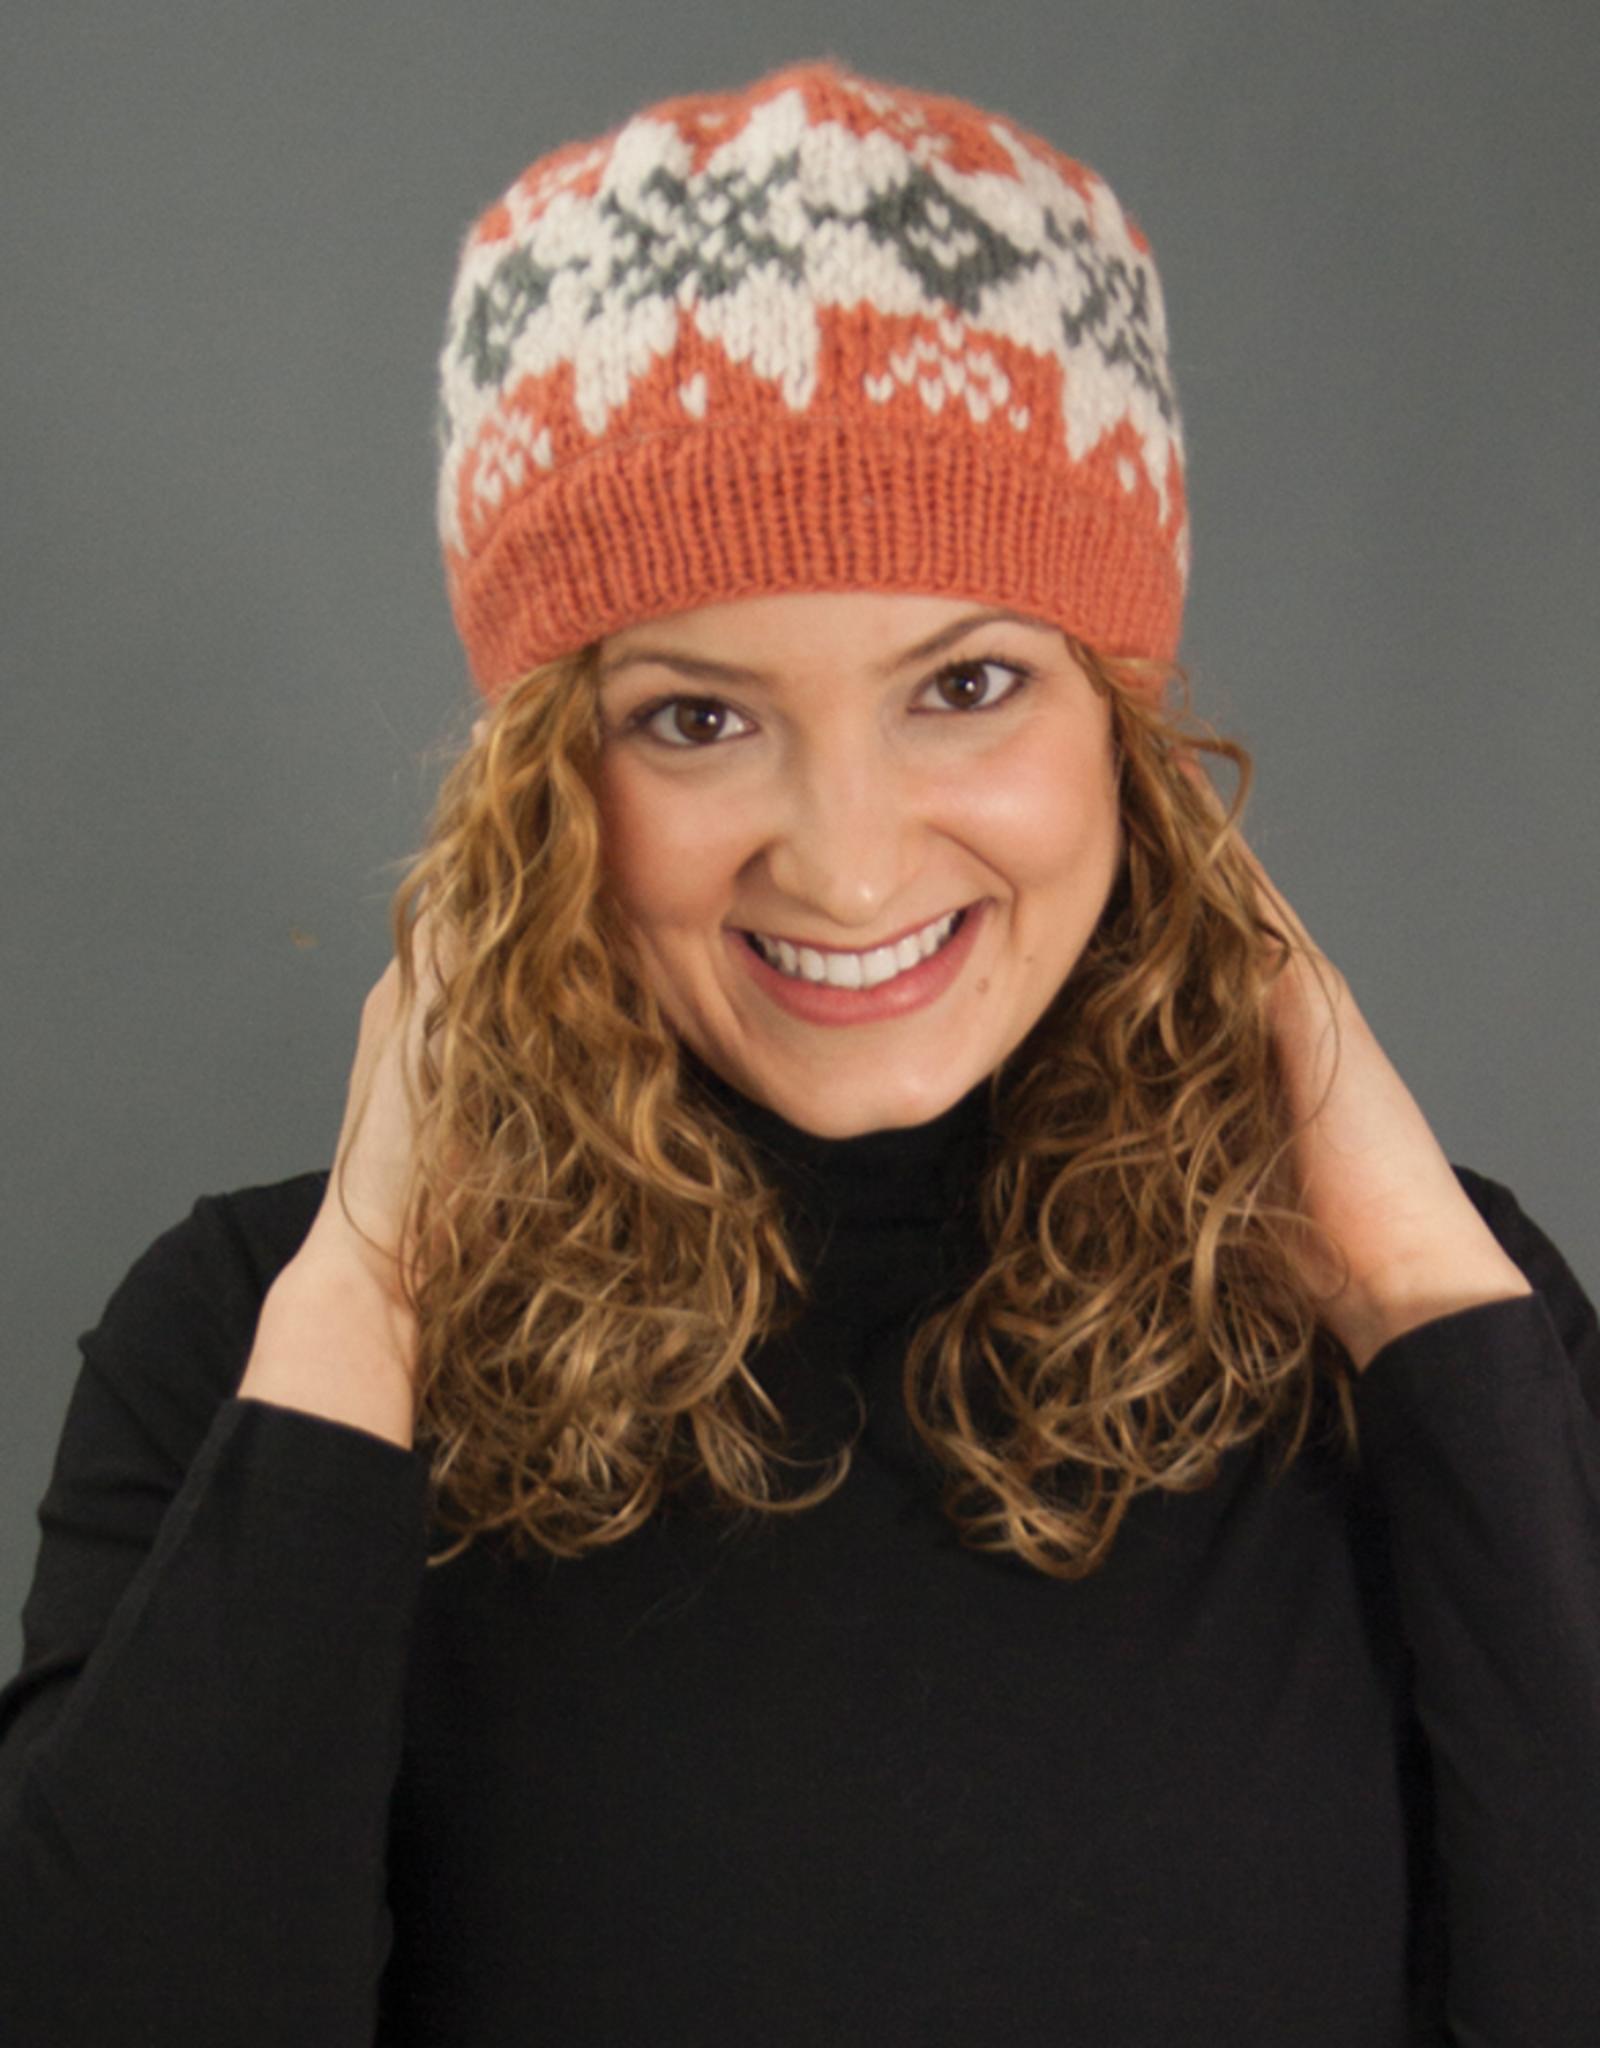 The Sweater Venture Snowflake Ski Cap